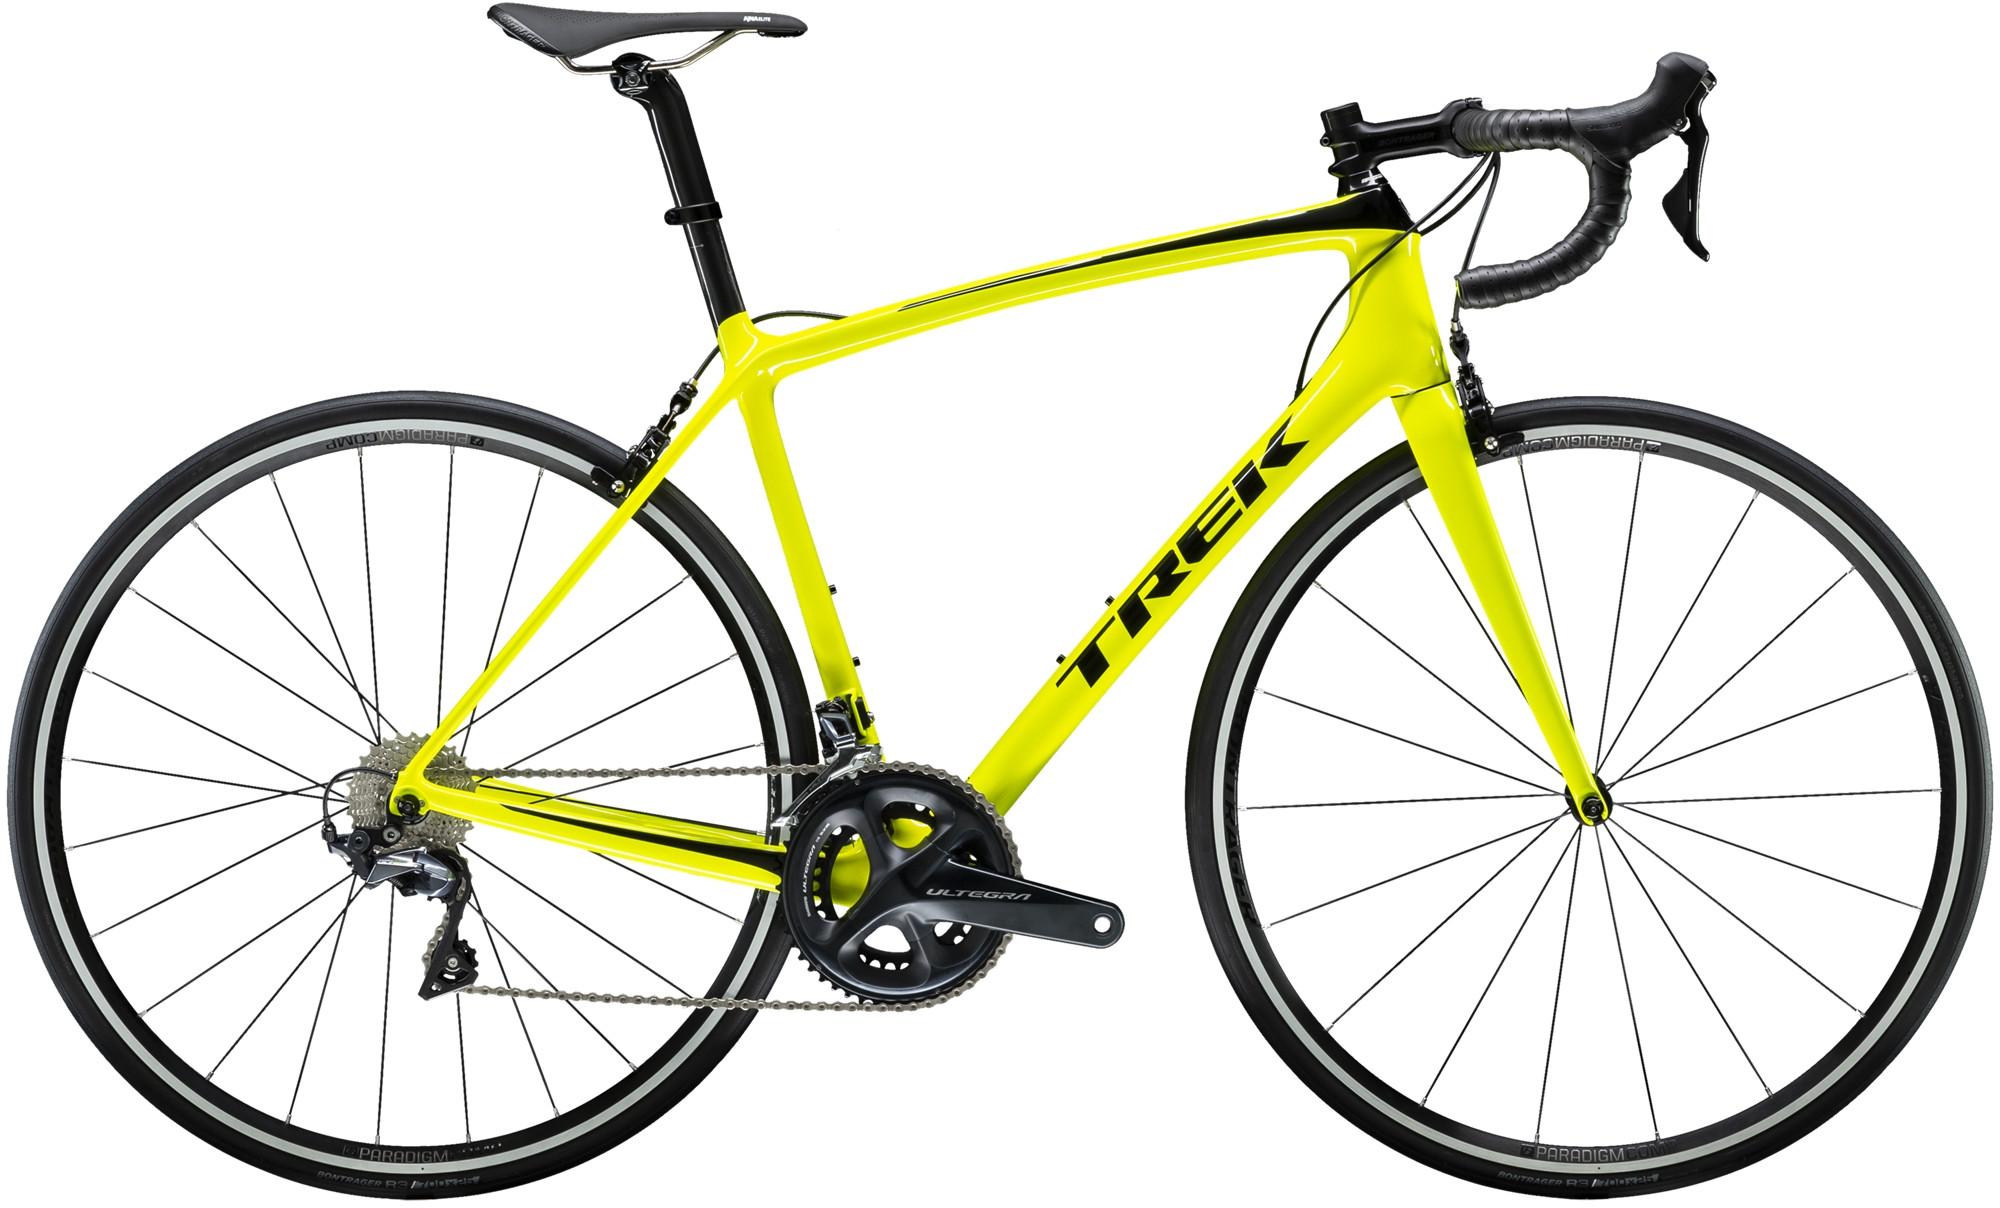 f09f2a0e0ad 2019 Trek Émonda SLR 6 - Lightweight - Road Bikes - Bikes - Shop ...